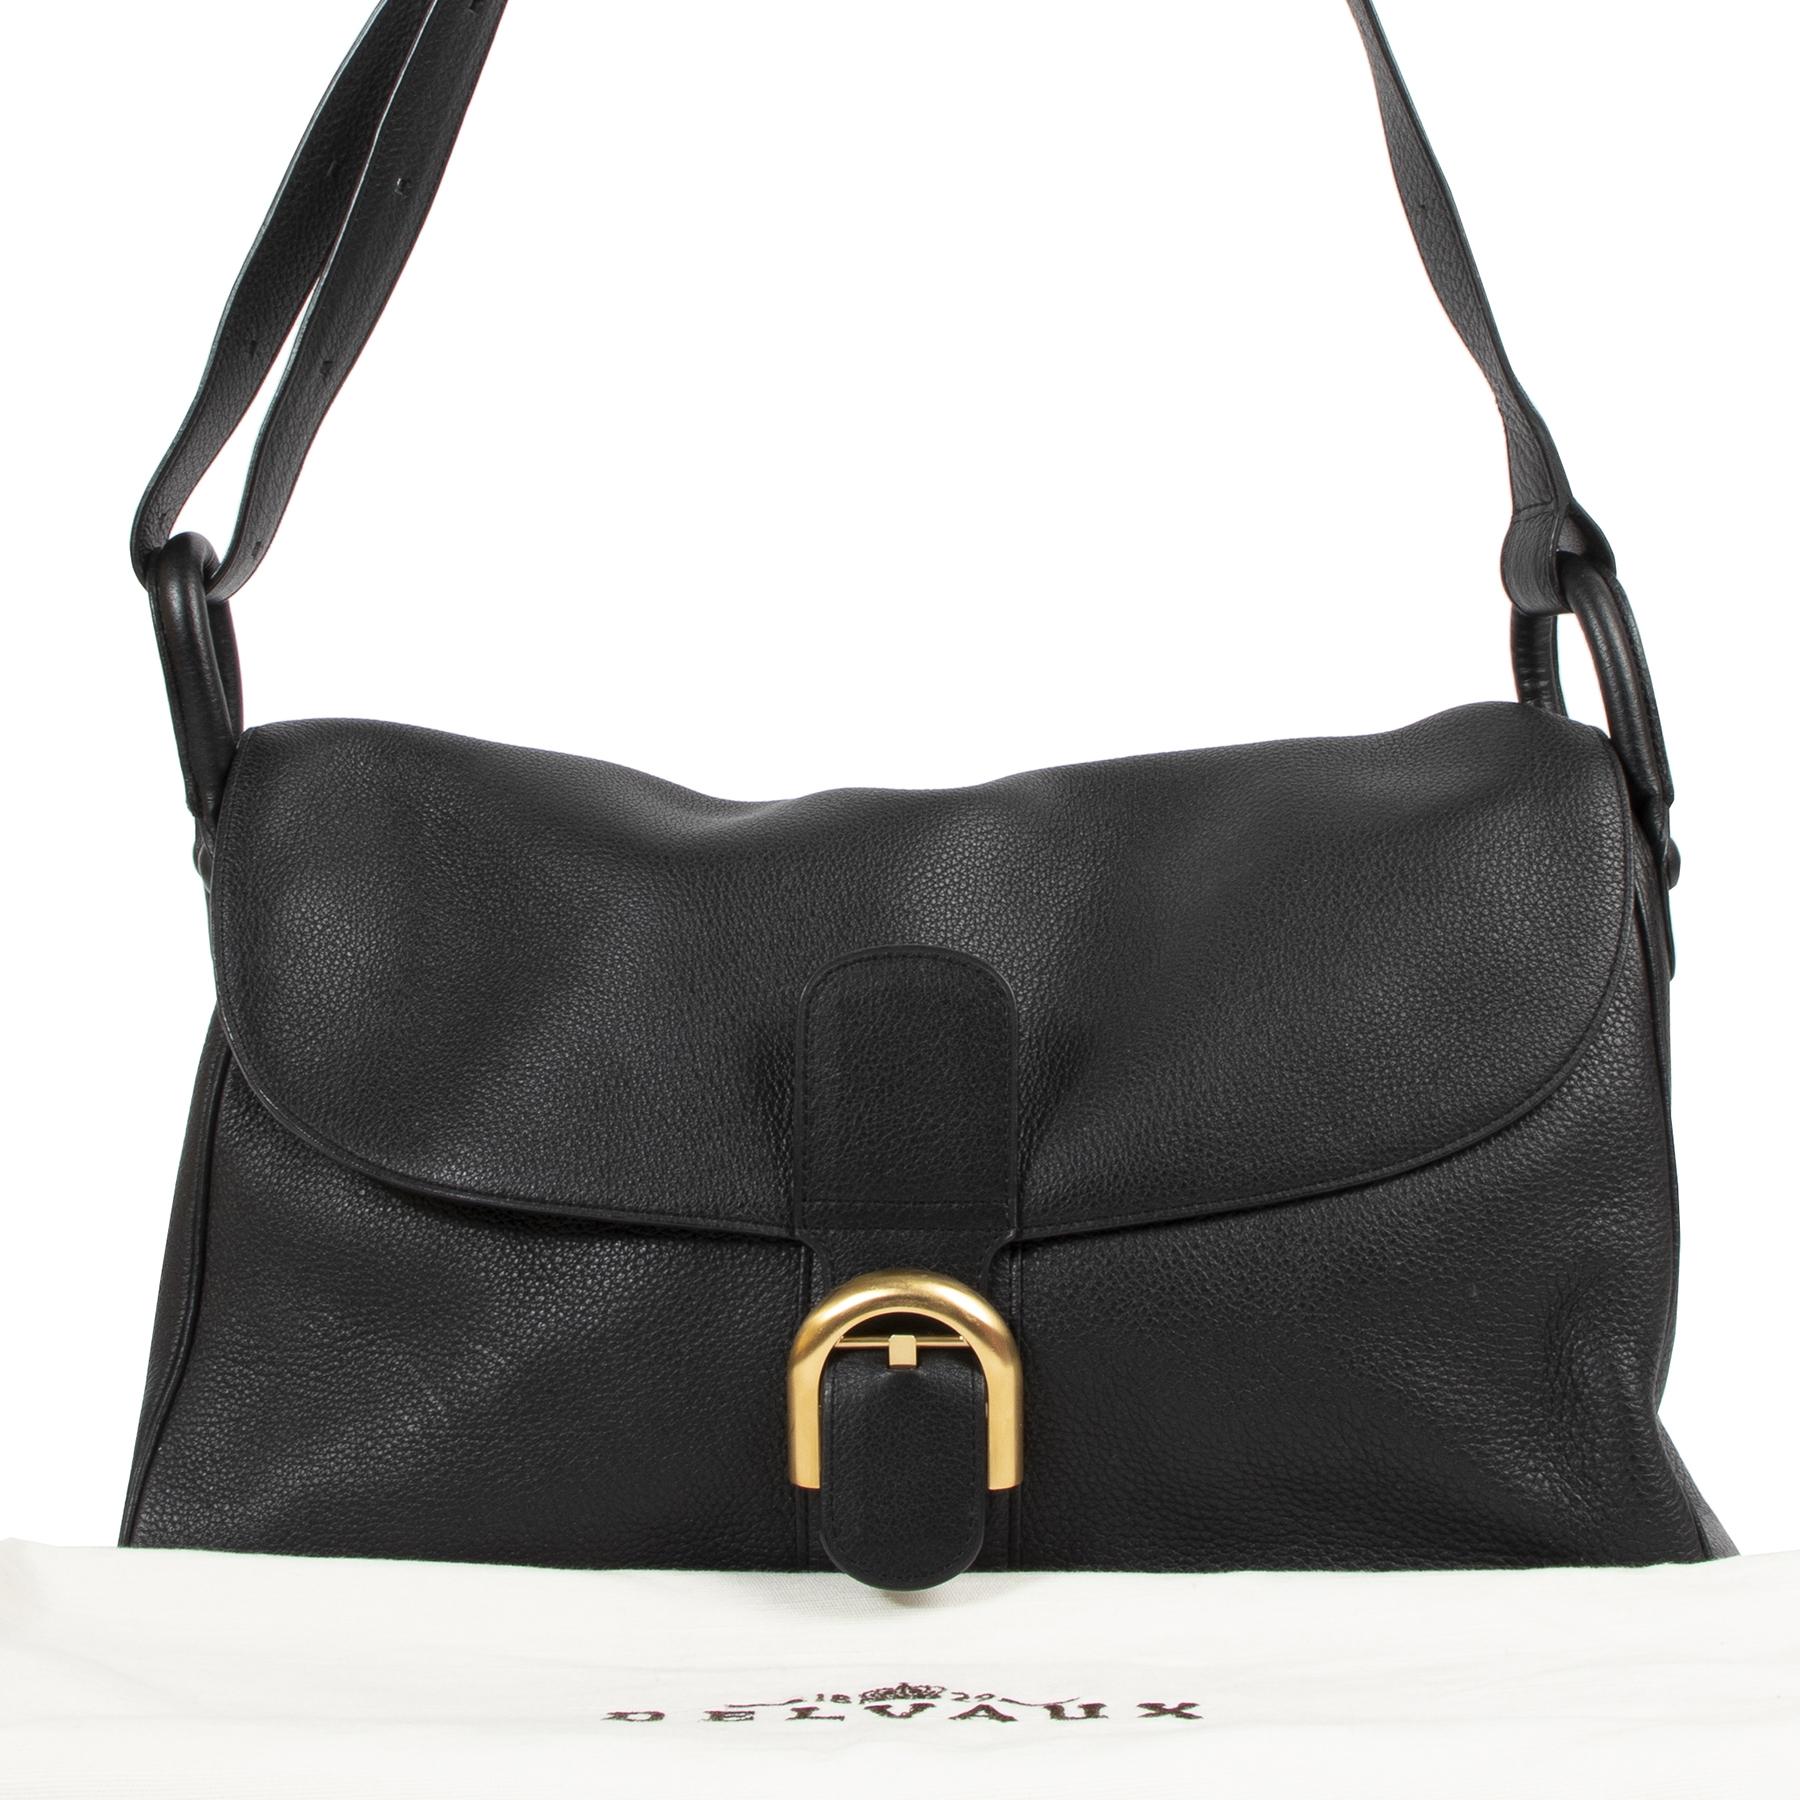 Authentic secondhand Delvaux Black Leather Brillant Besace Bag designer bags fashion luxury vintage webshop safe secure online shopping